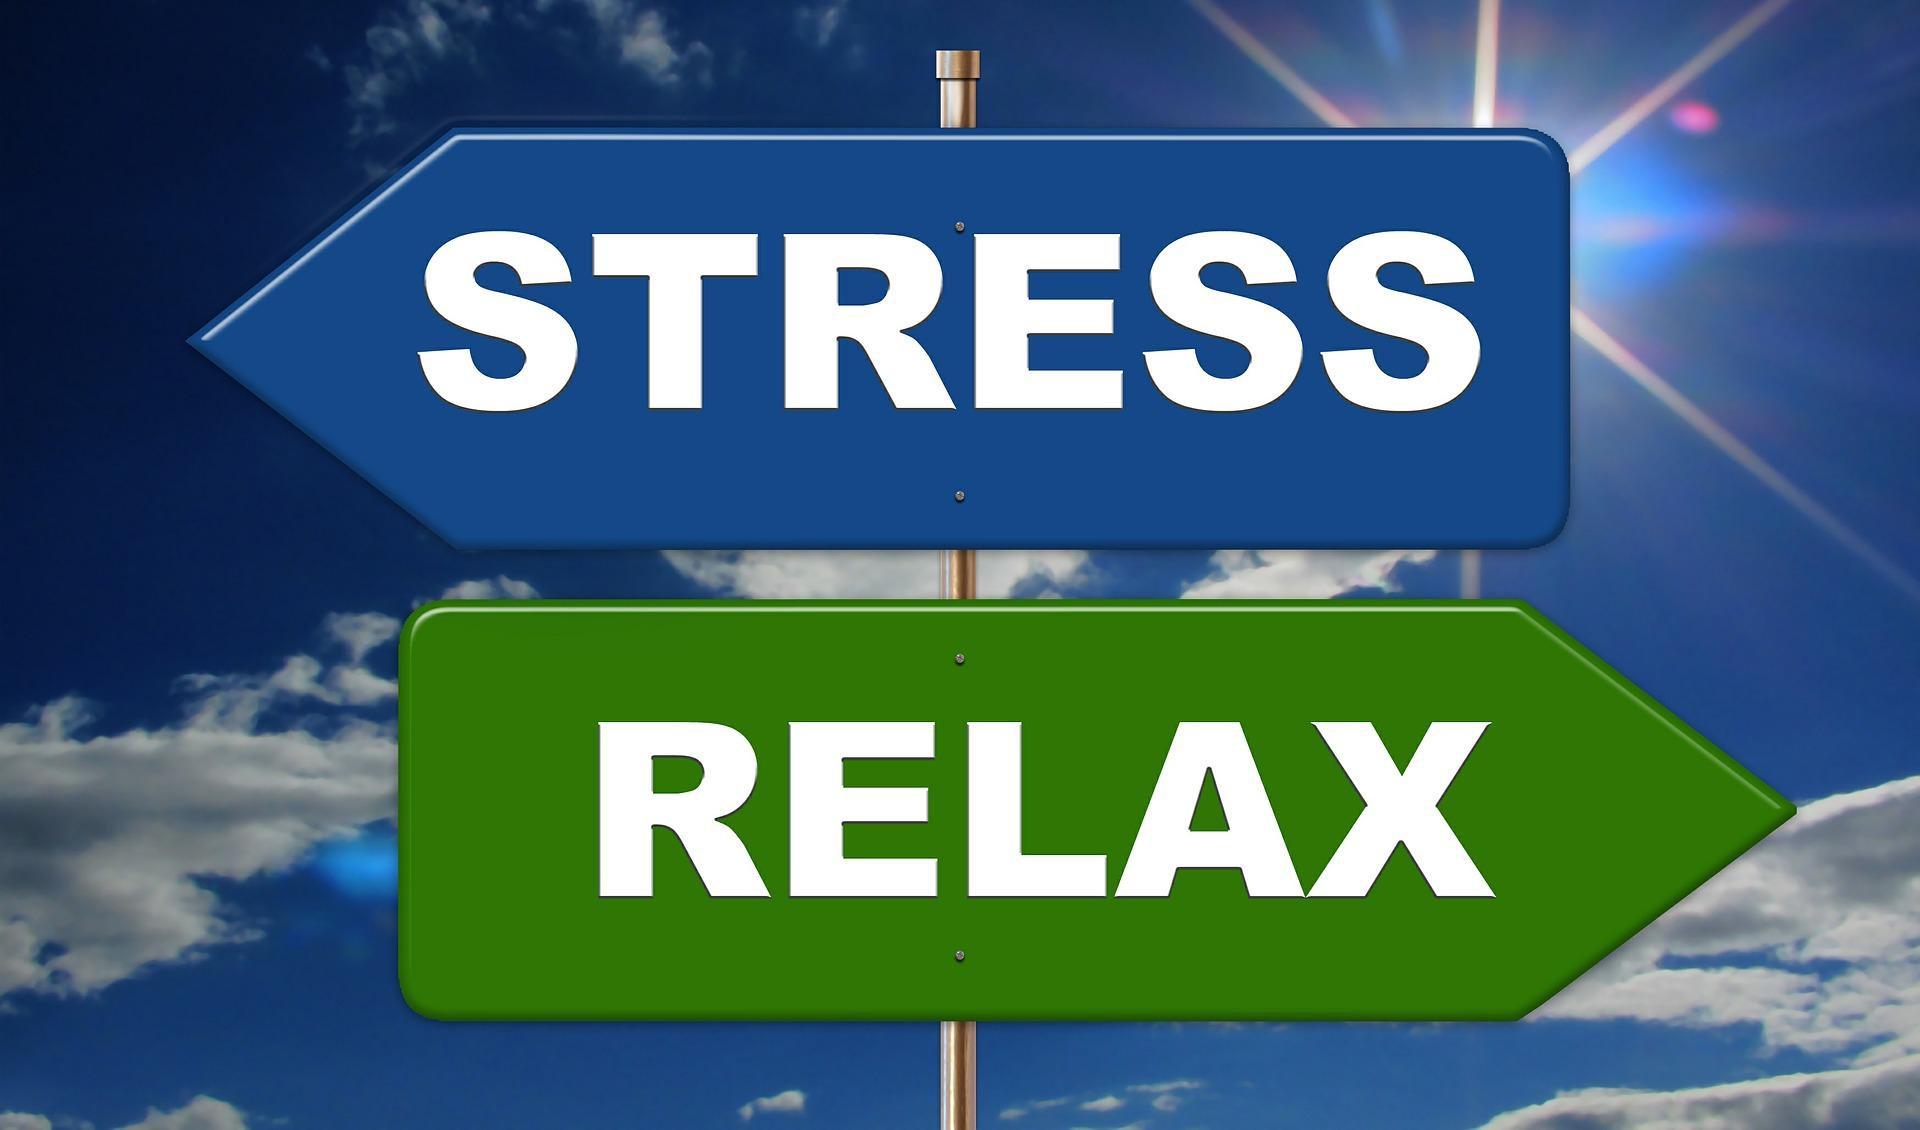 Stress Relax Image.jpg